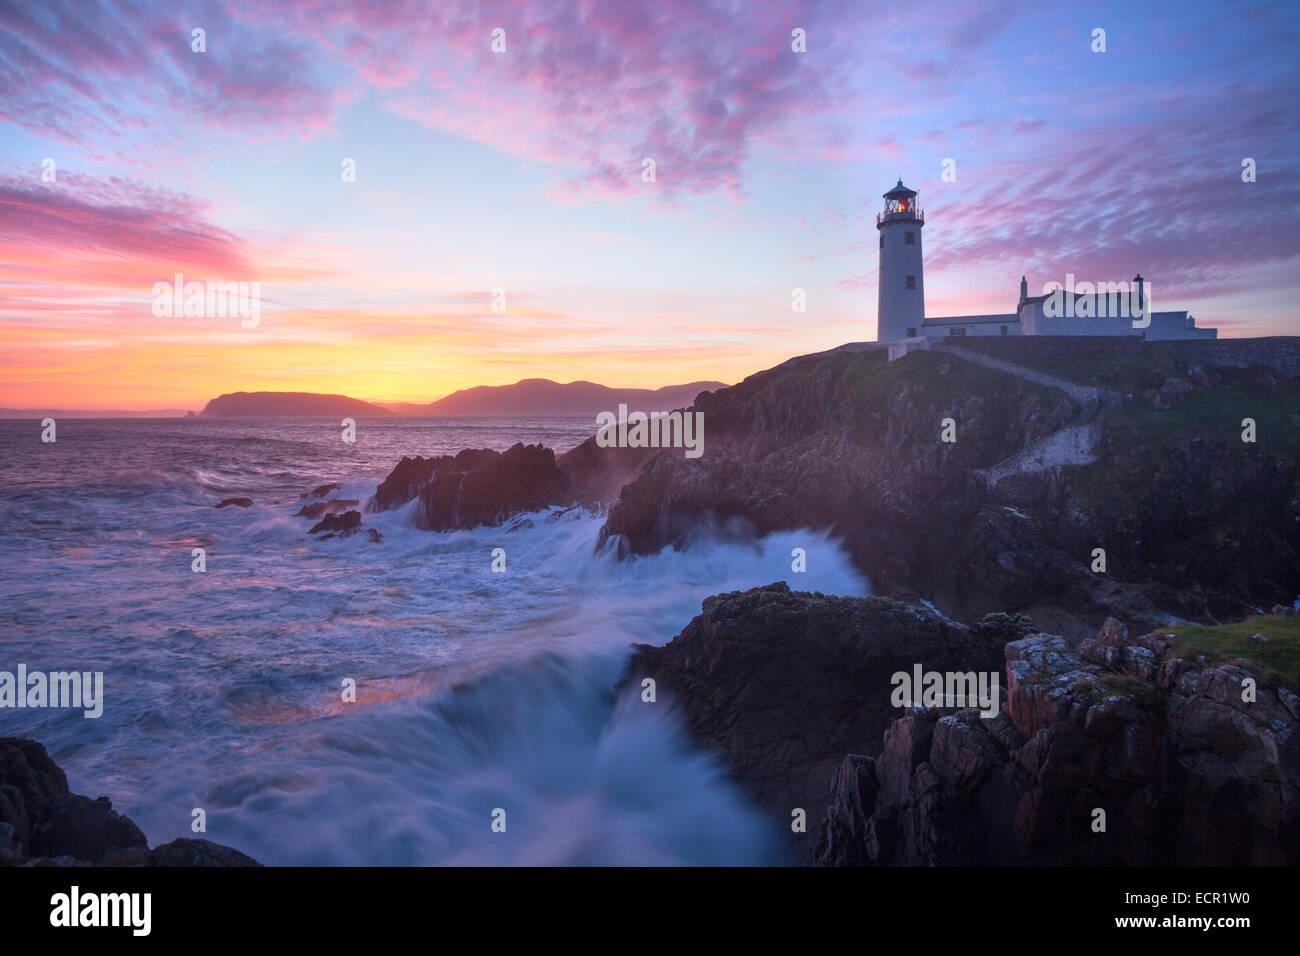 Sunrise over Fanad Head Lighthouse, Fanad Head, County Donegal, Ireland. - Stock Image